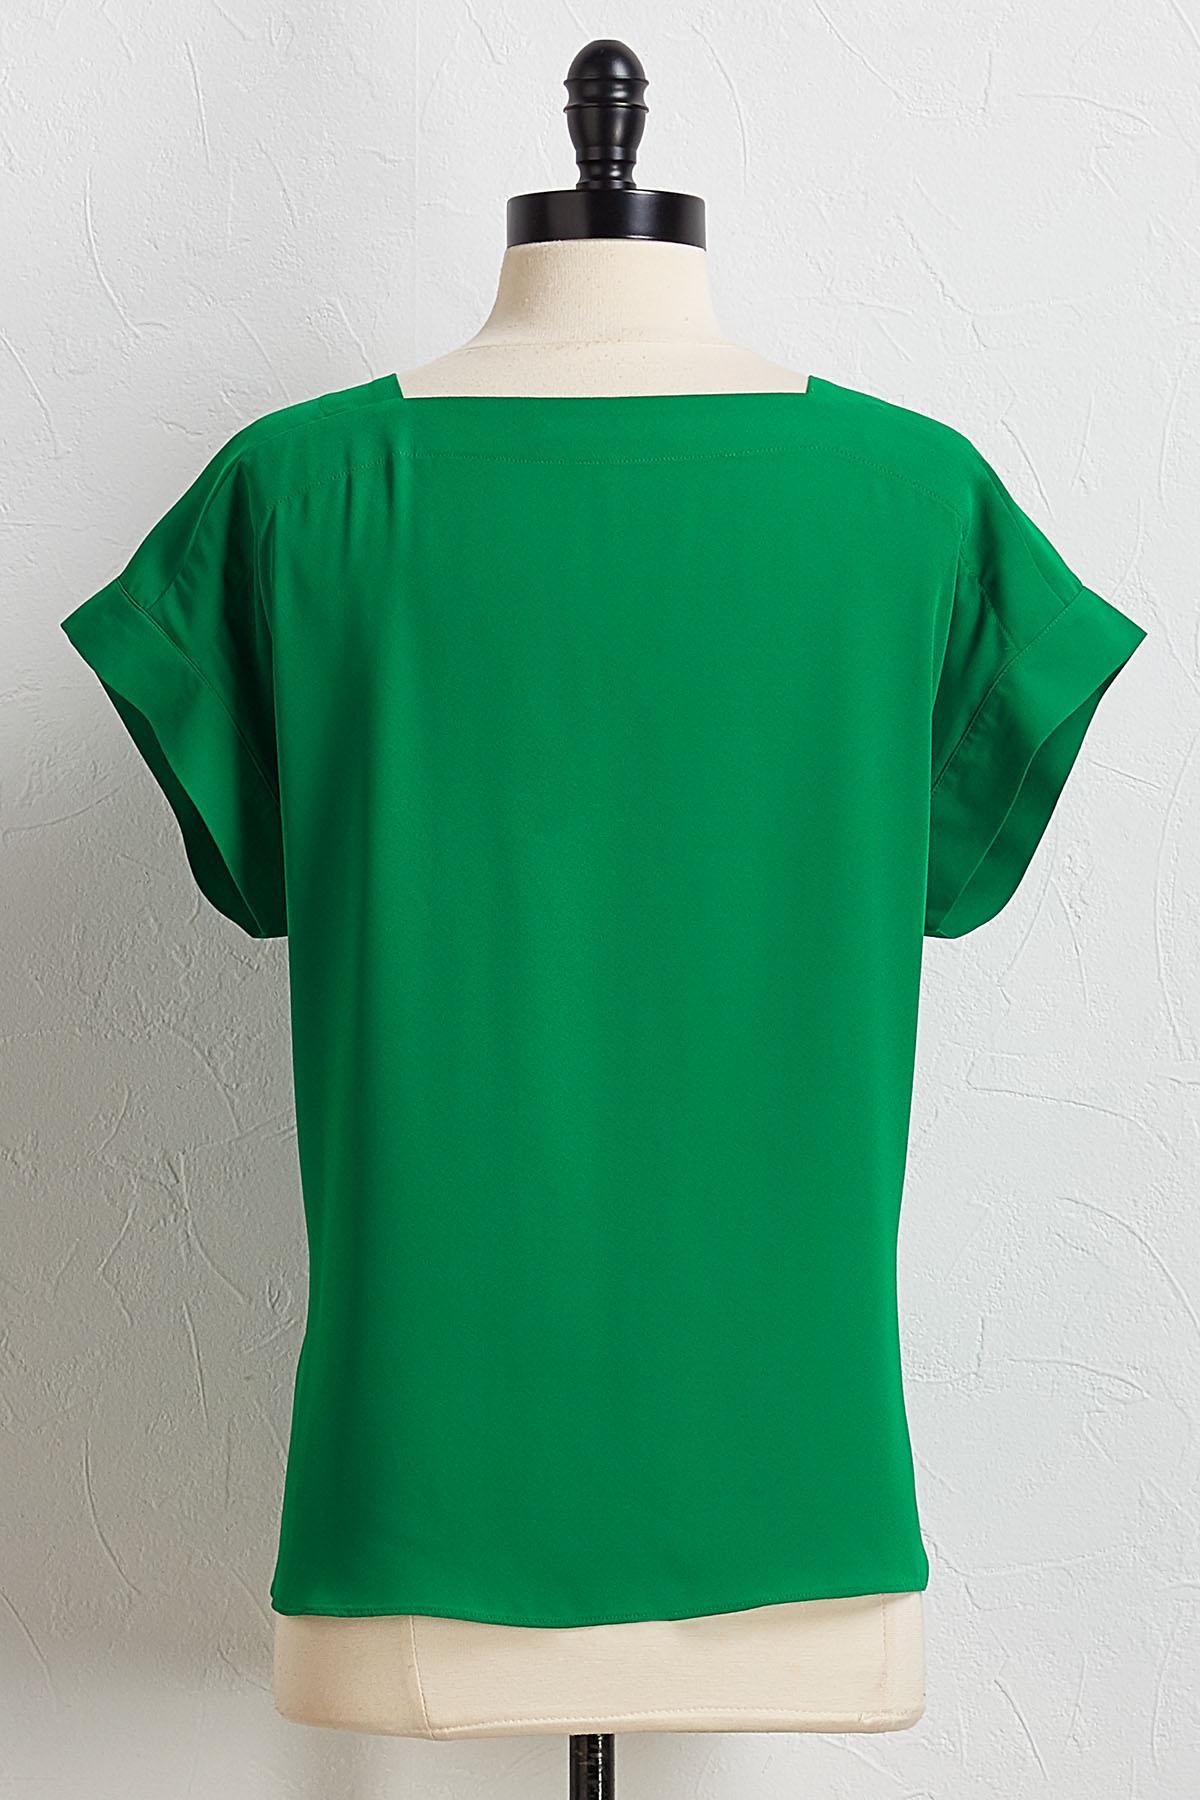 Square Pullover Top